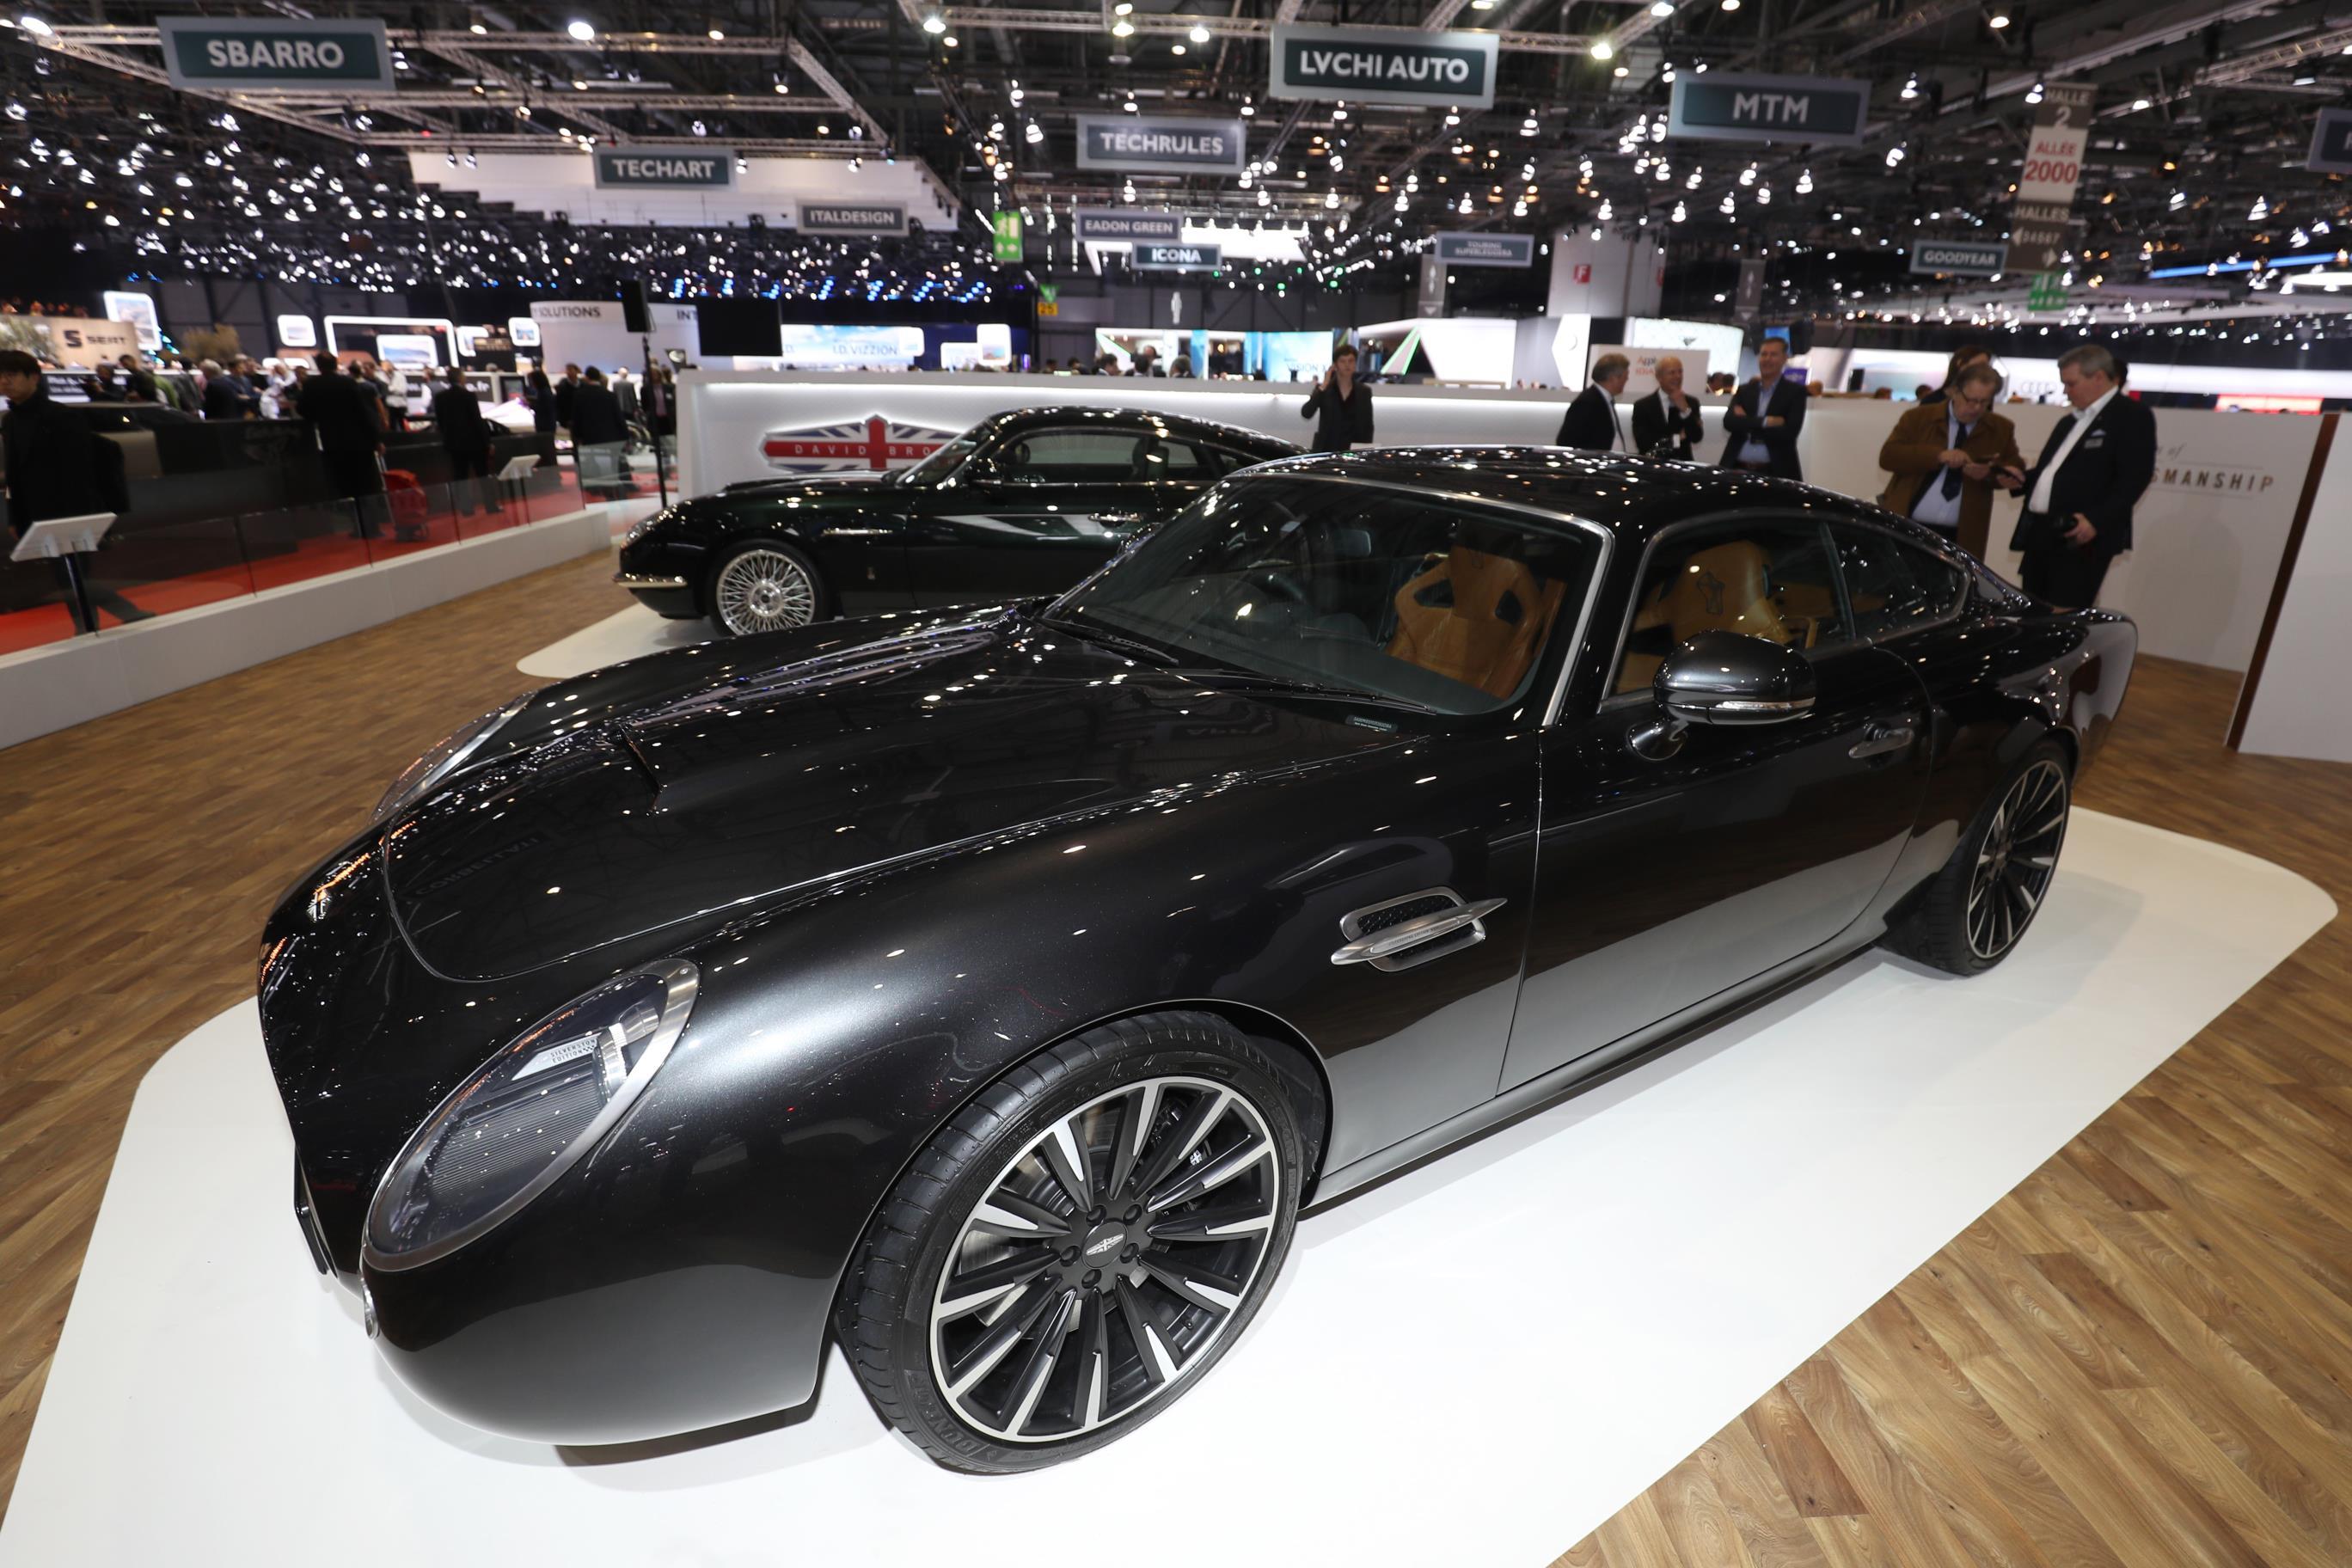 Geneva Motor Show 2018 Mega Gallery Part 1 (200)